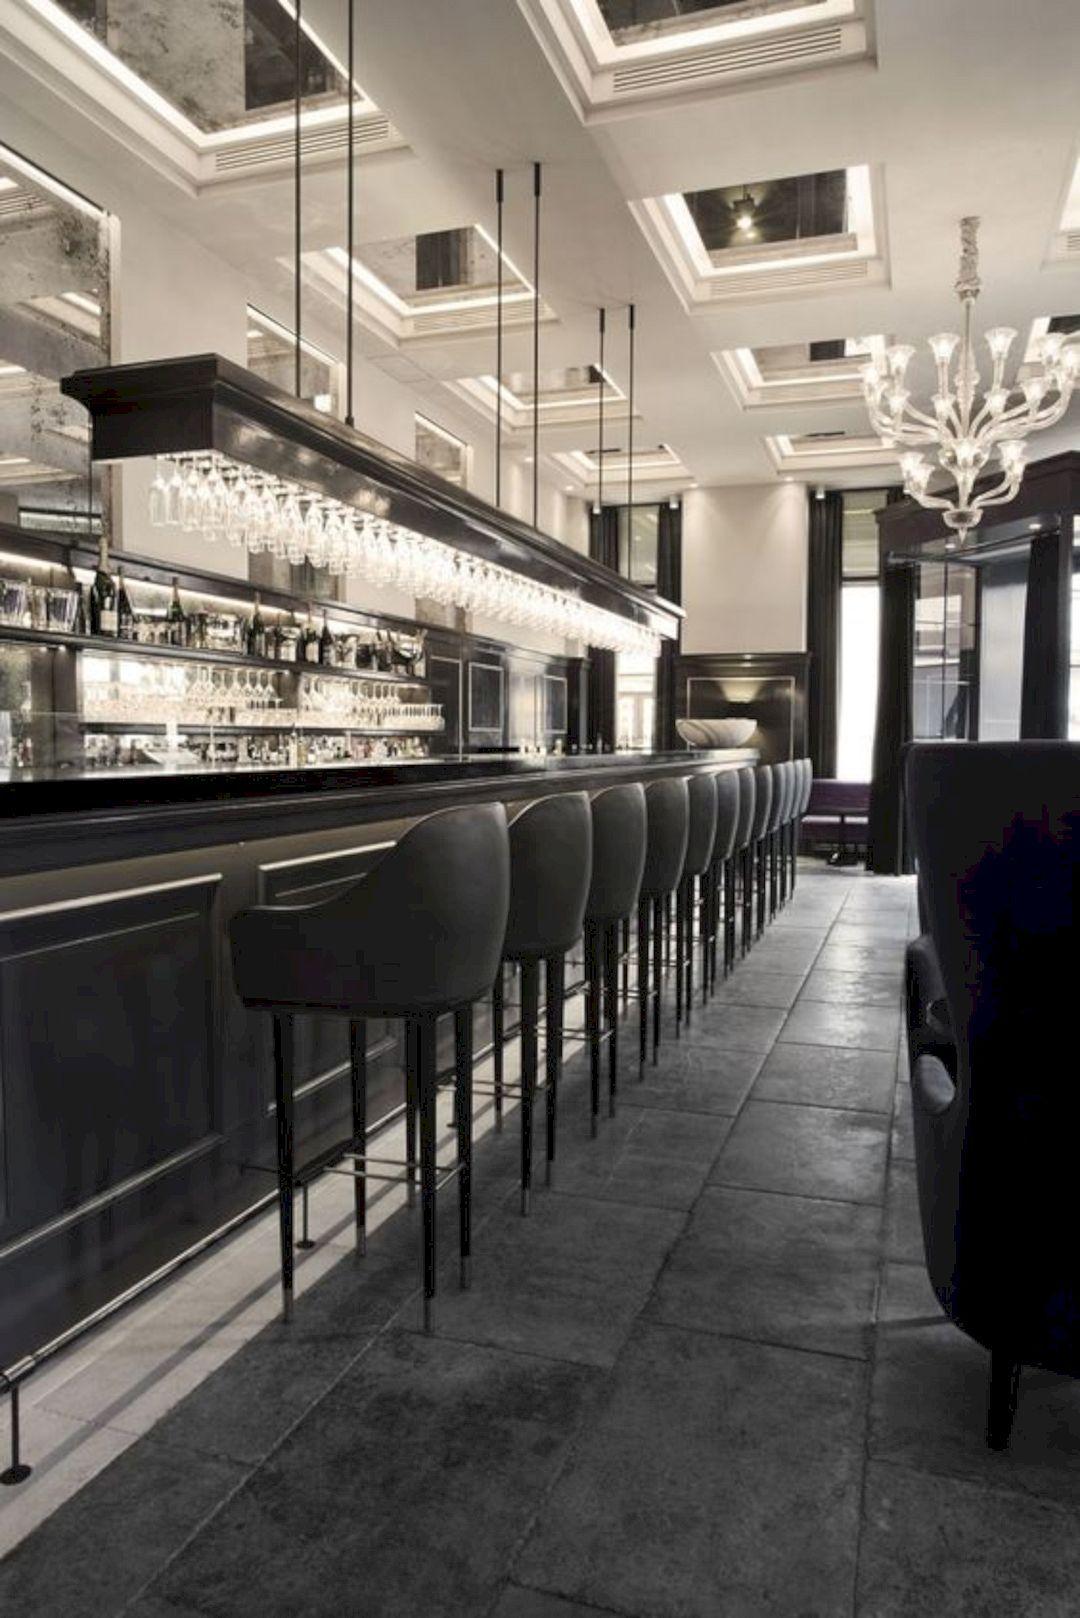 15 amazing bar interior design ideas https www futuristarchitecture com